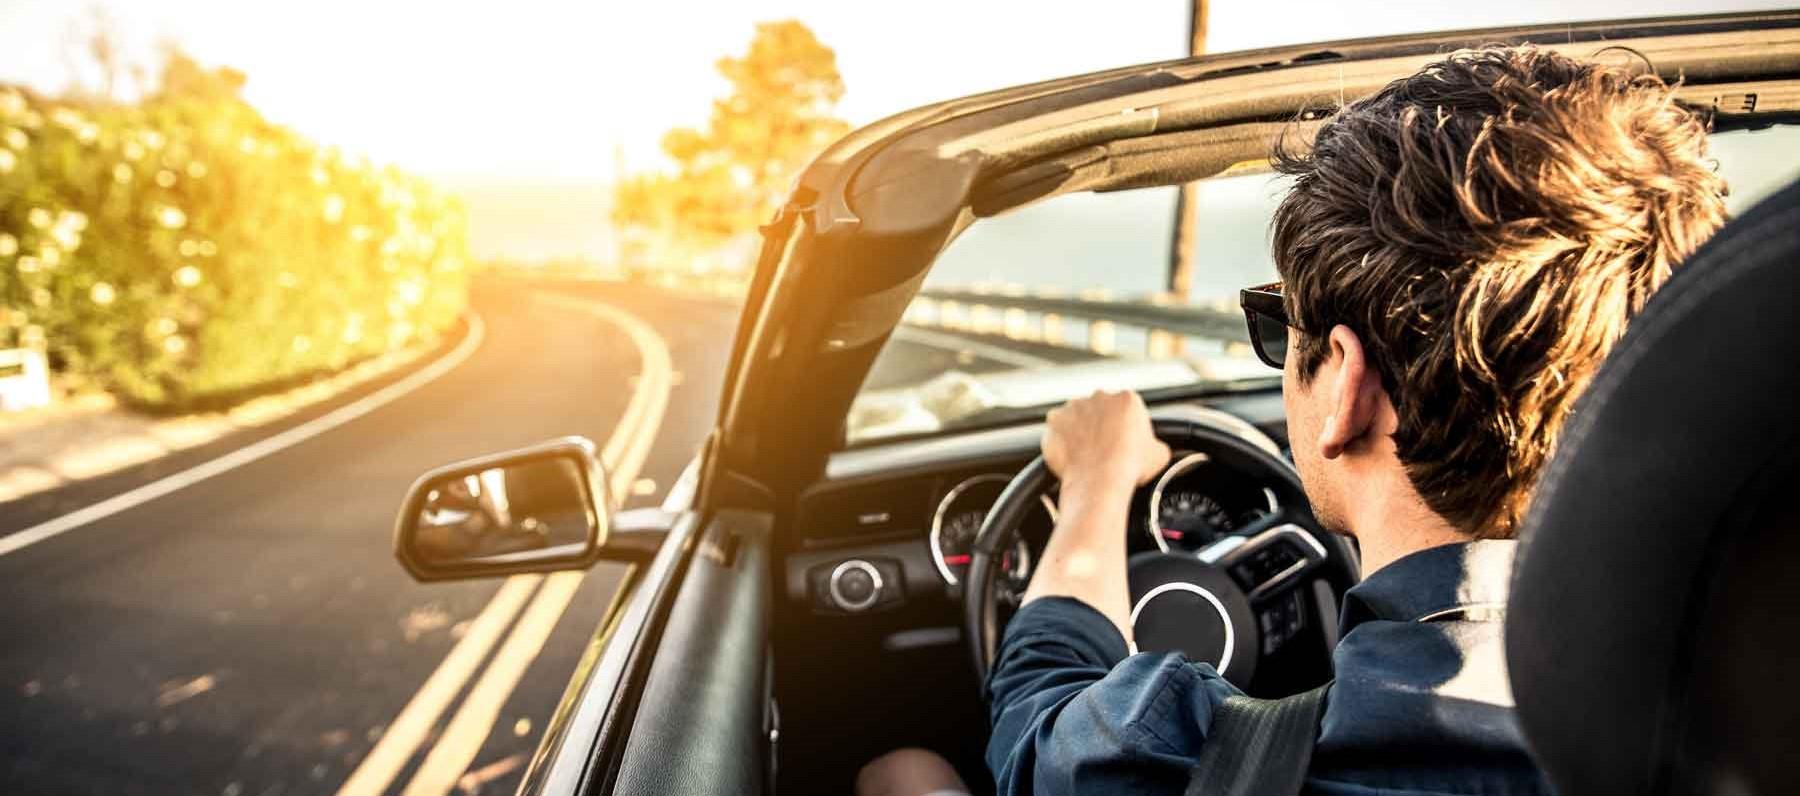 Mann genießt Fahrt im Cabrio.